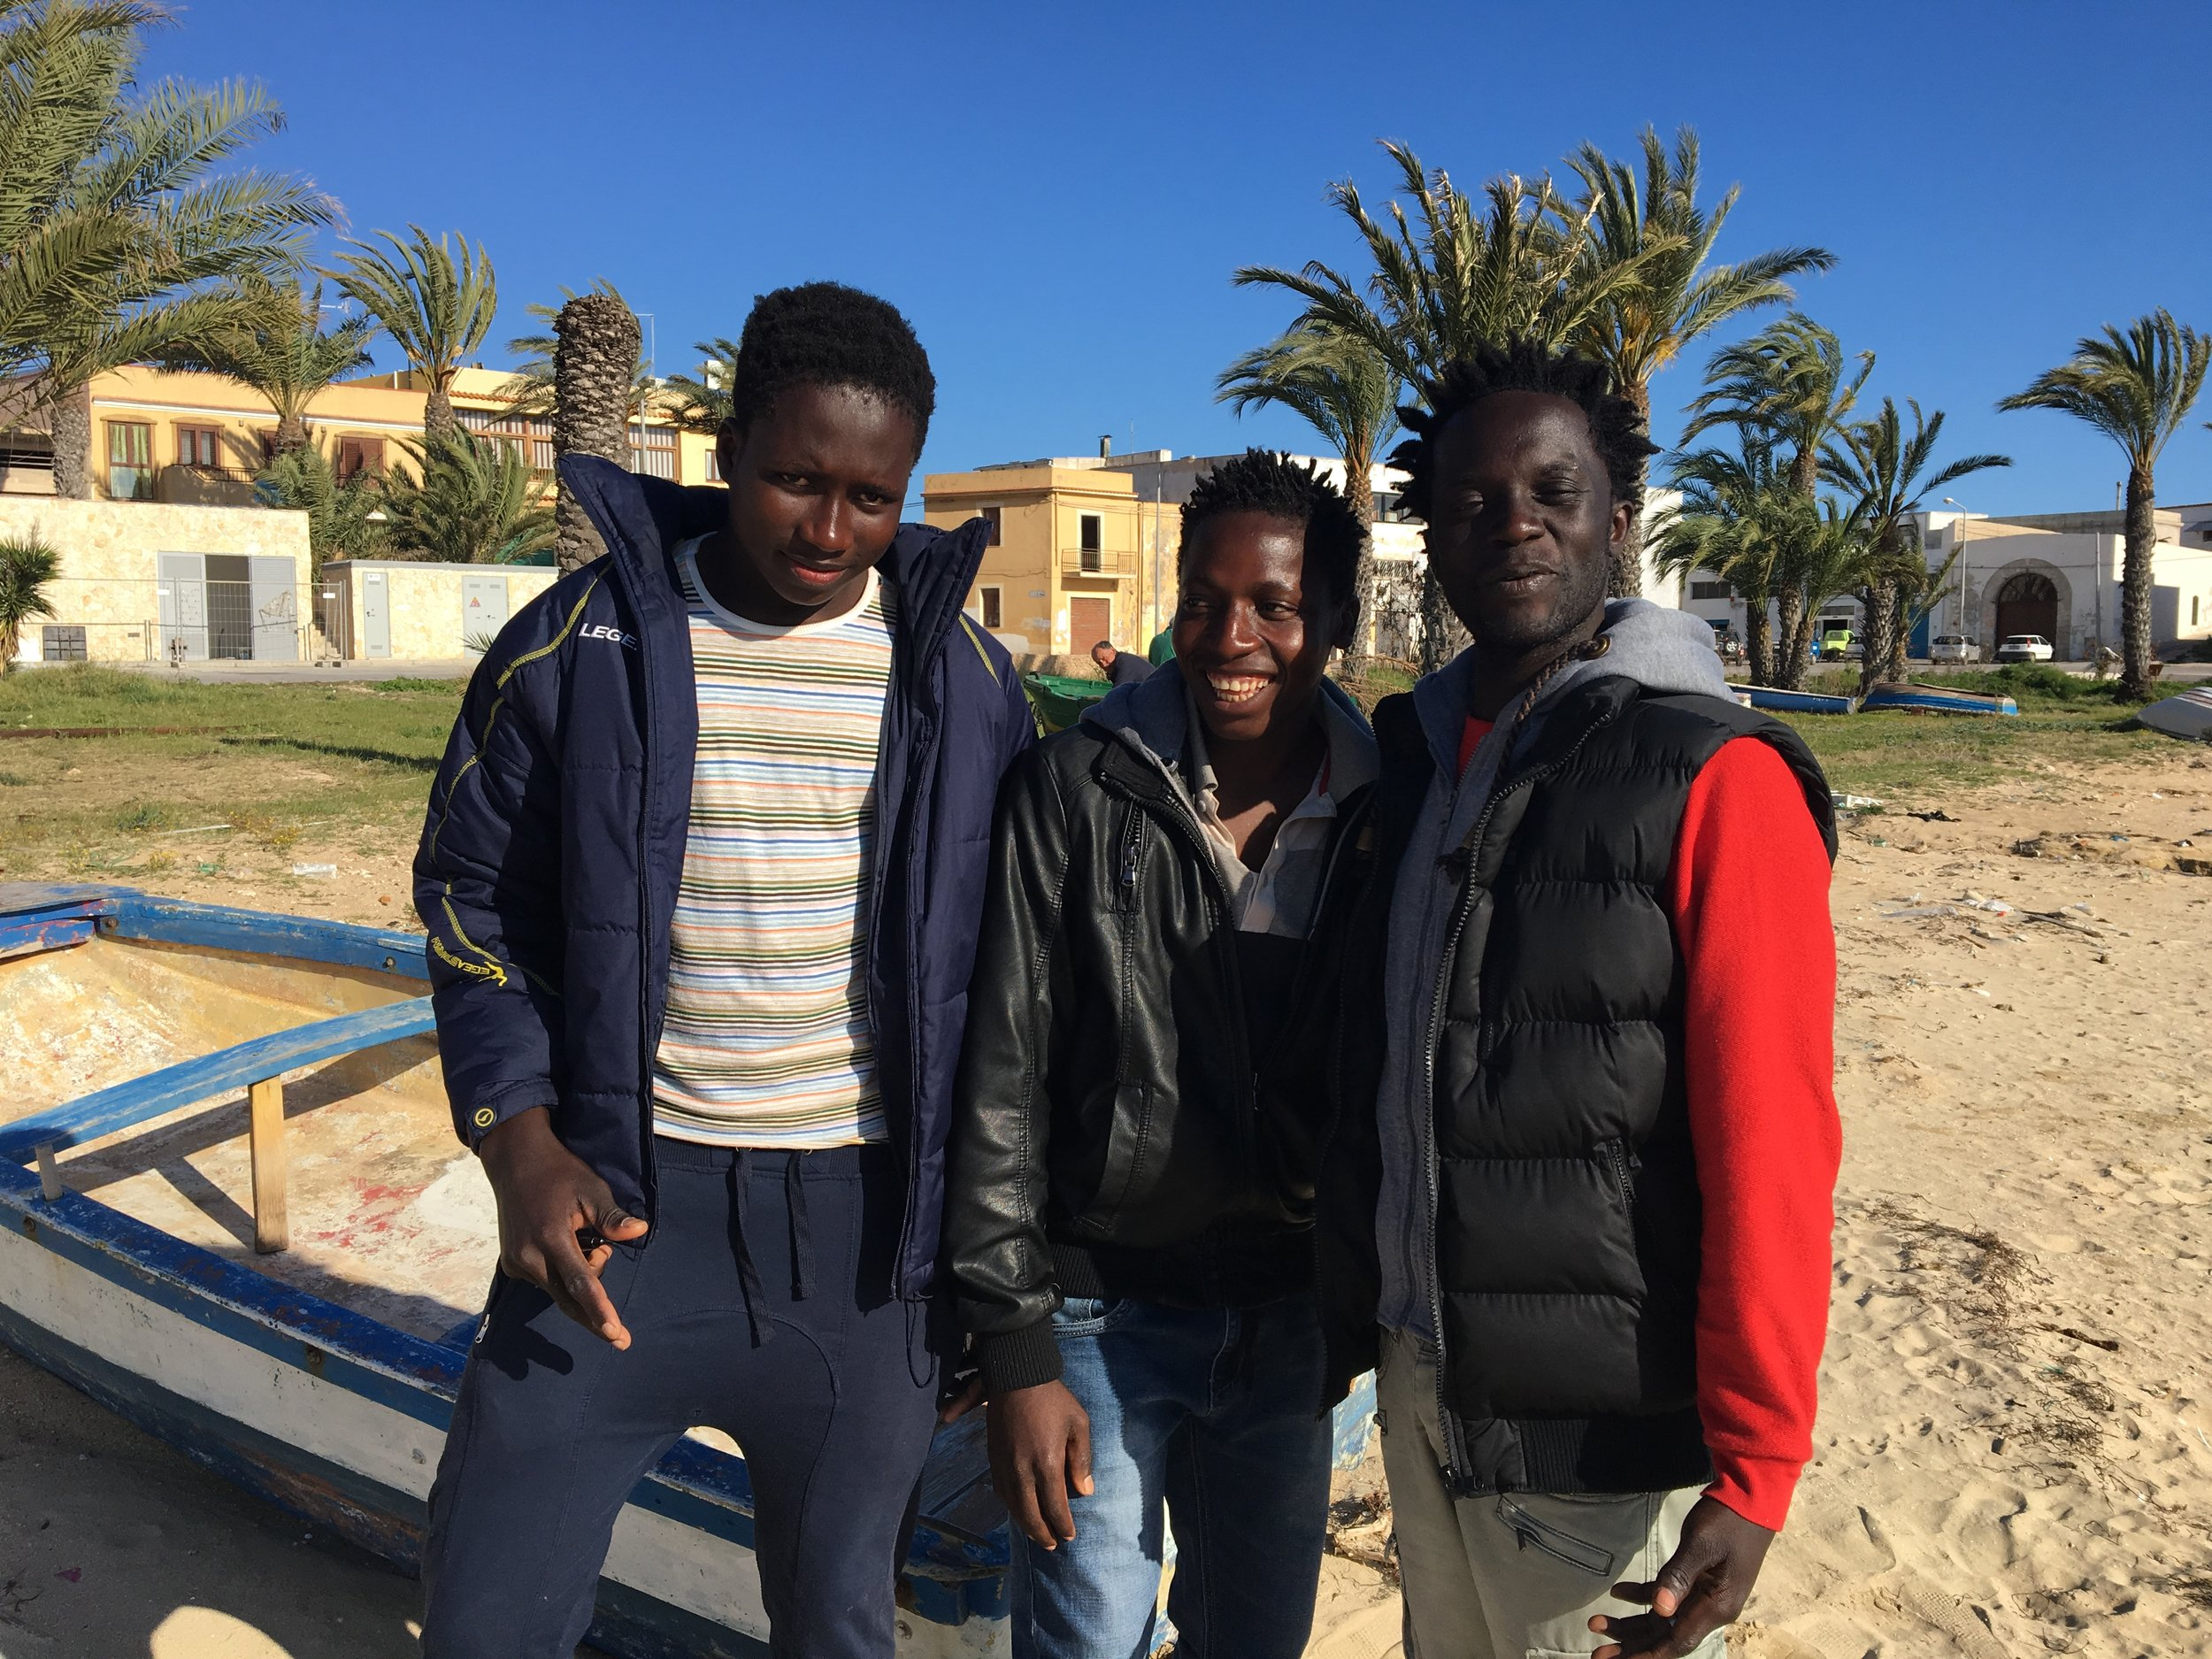 Ebrima and friends posing for the camera. Lampedusa, Italy; 3 April 2017. ©Pamela Kerpius